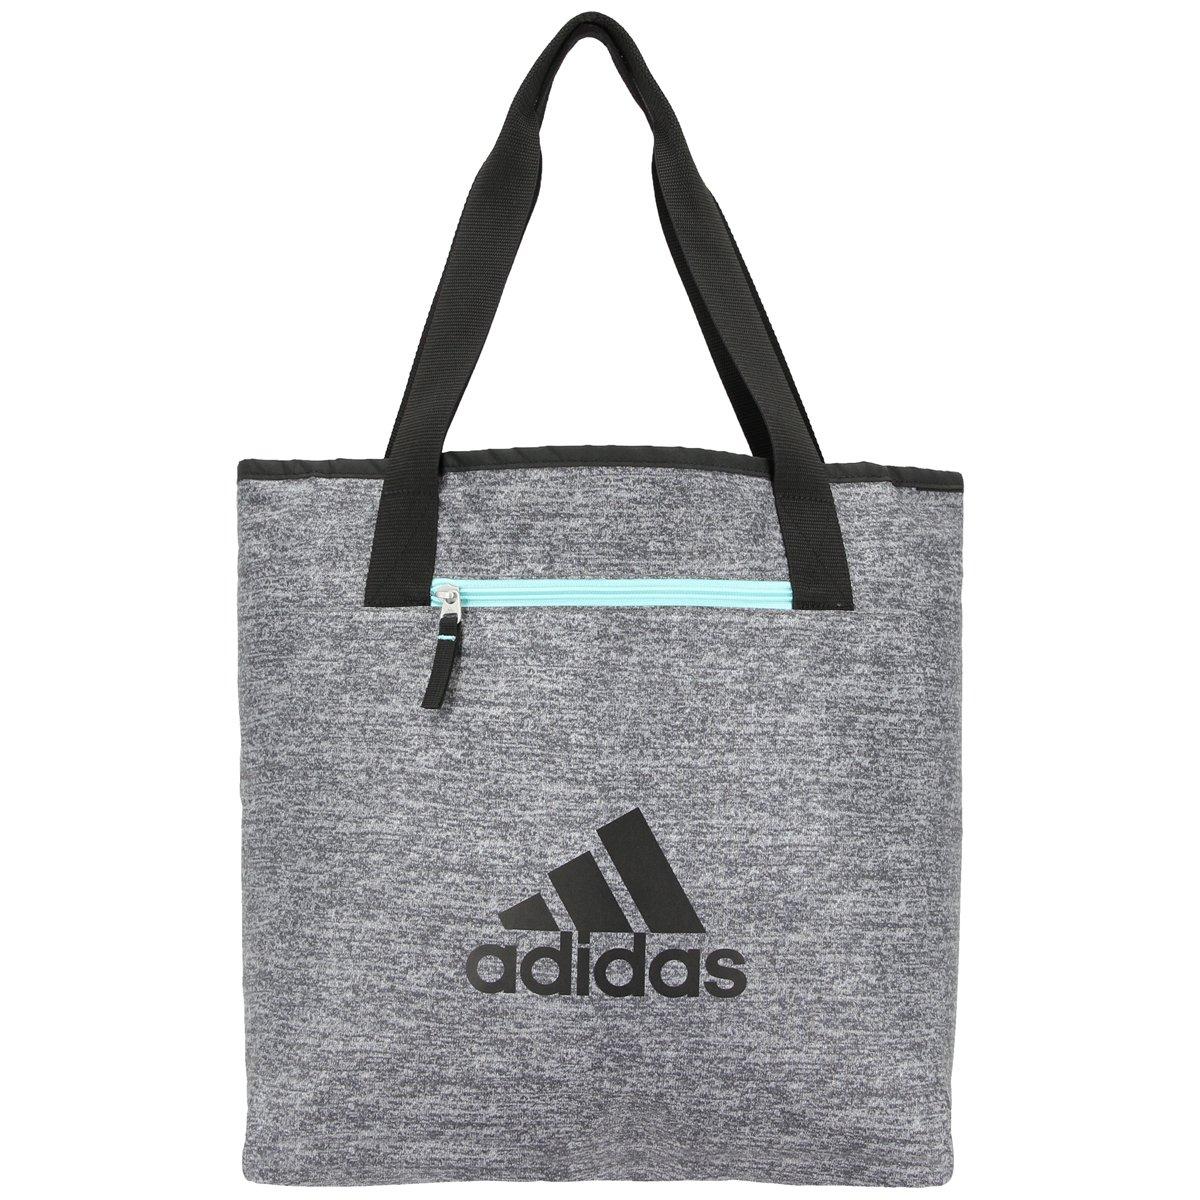 5fdfa8c7684c adidas Studio II Tote Bag